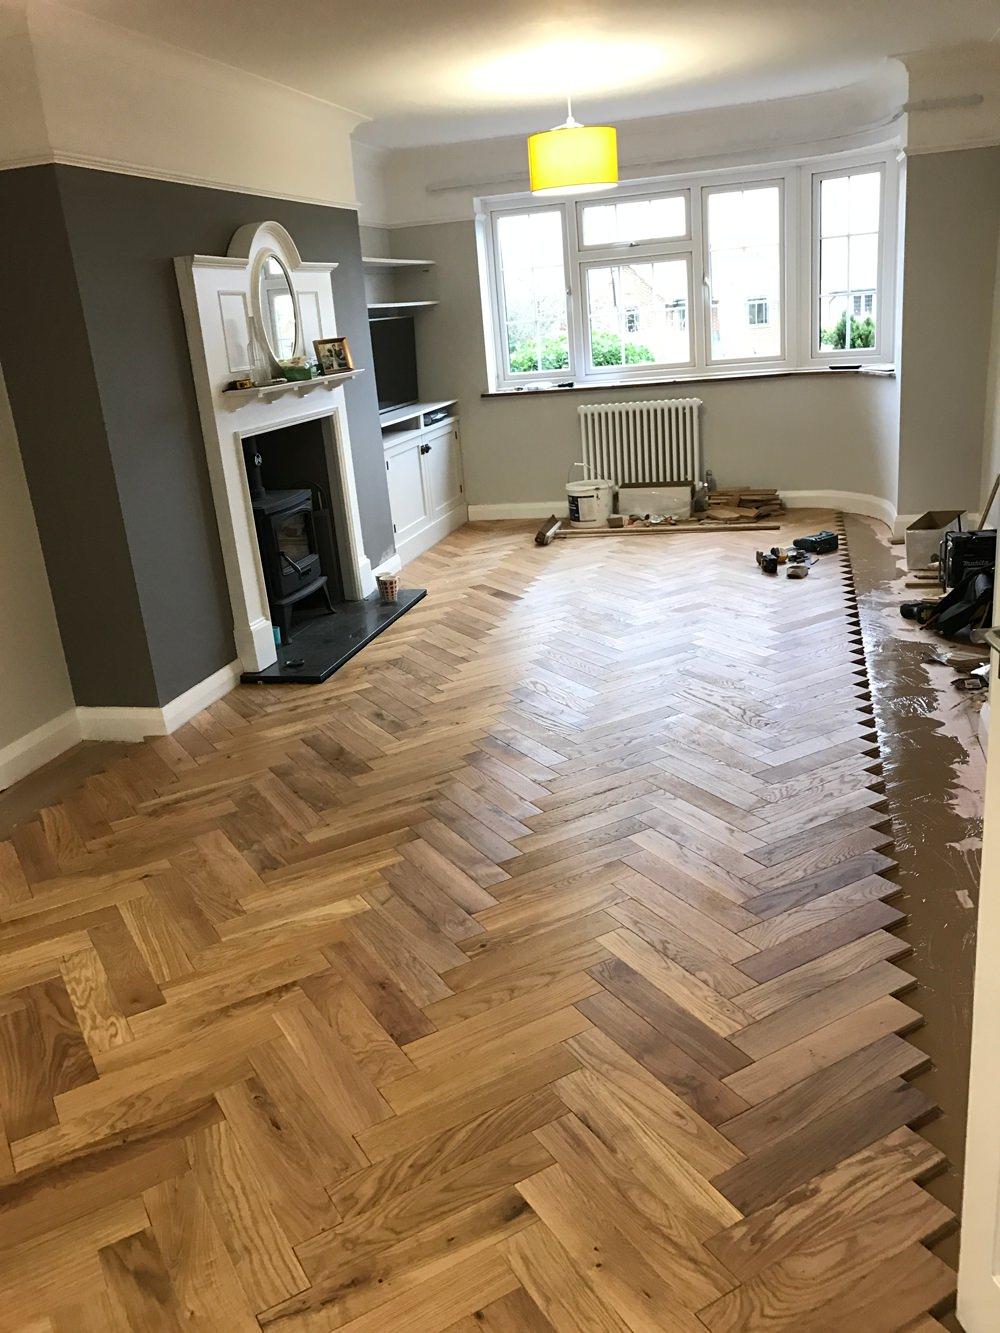 1930s House Living Room Renovation Parquet Floor Flooring Herringbone Oak Solid Wood Hardwood